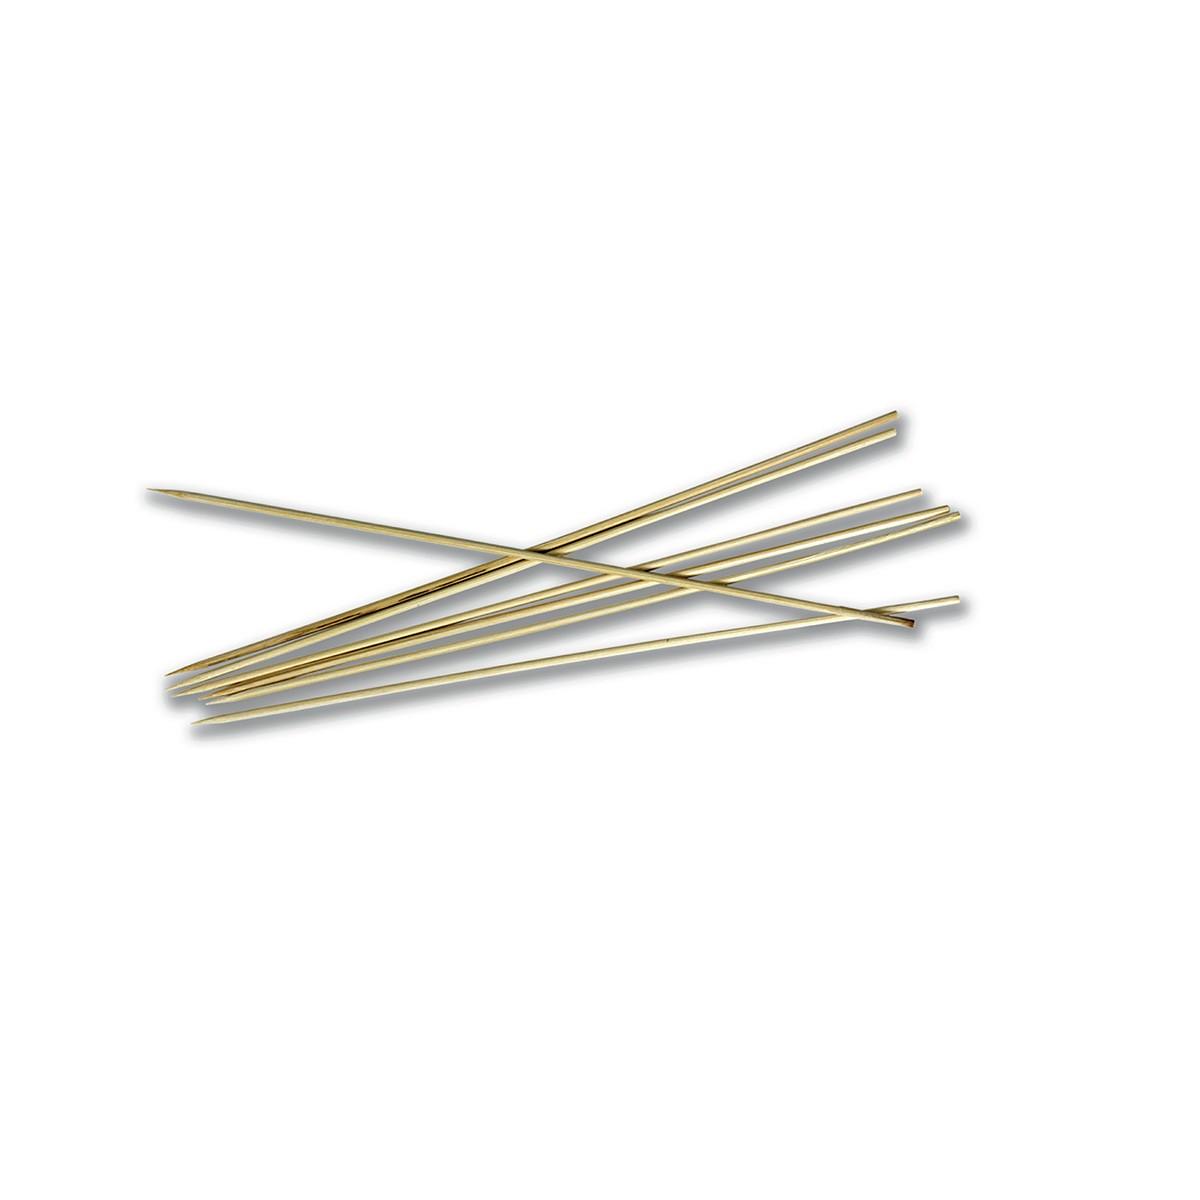 Bamboo Skewer 20cm | 200pcsx100pkts